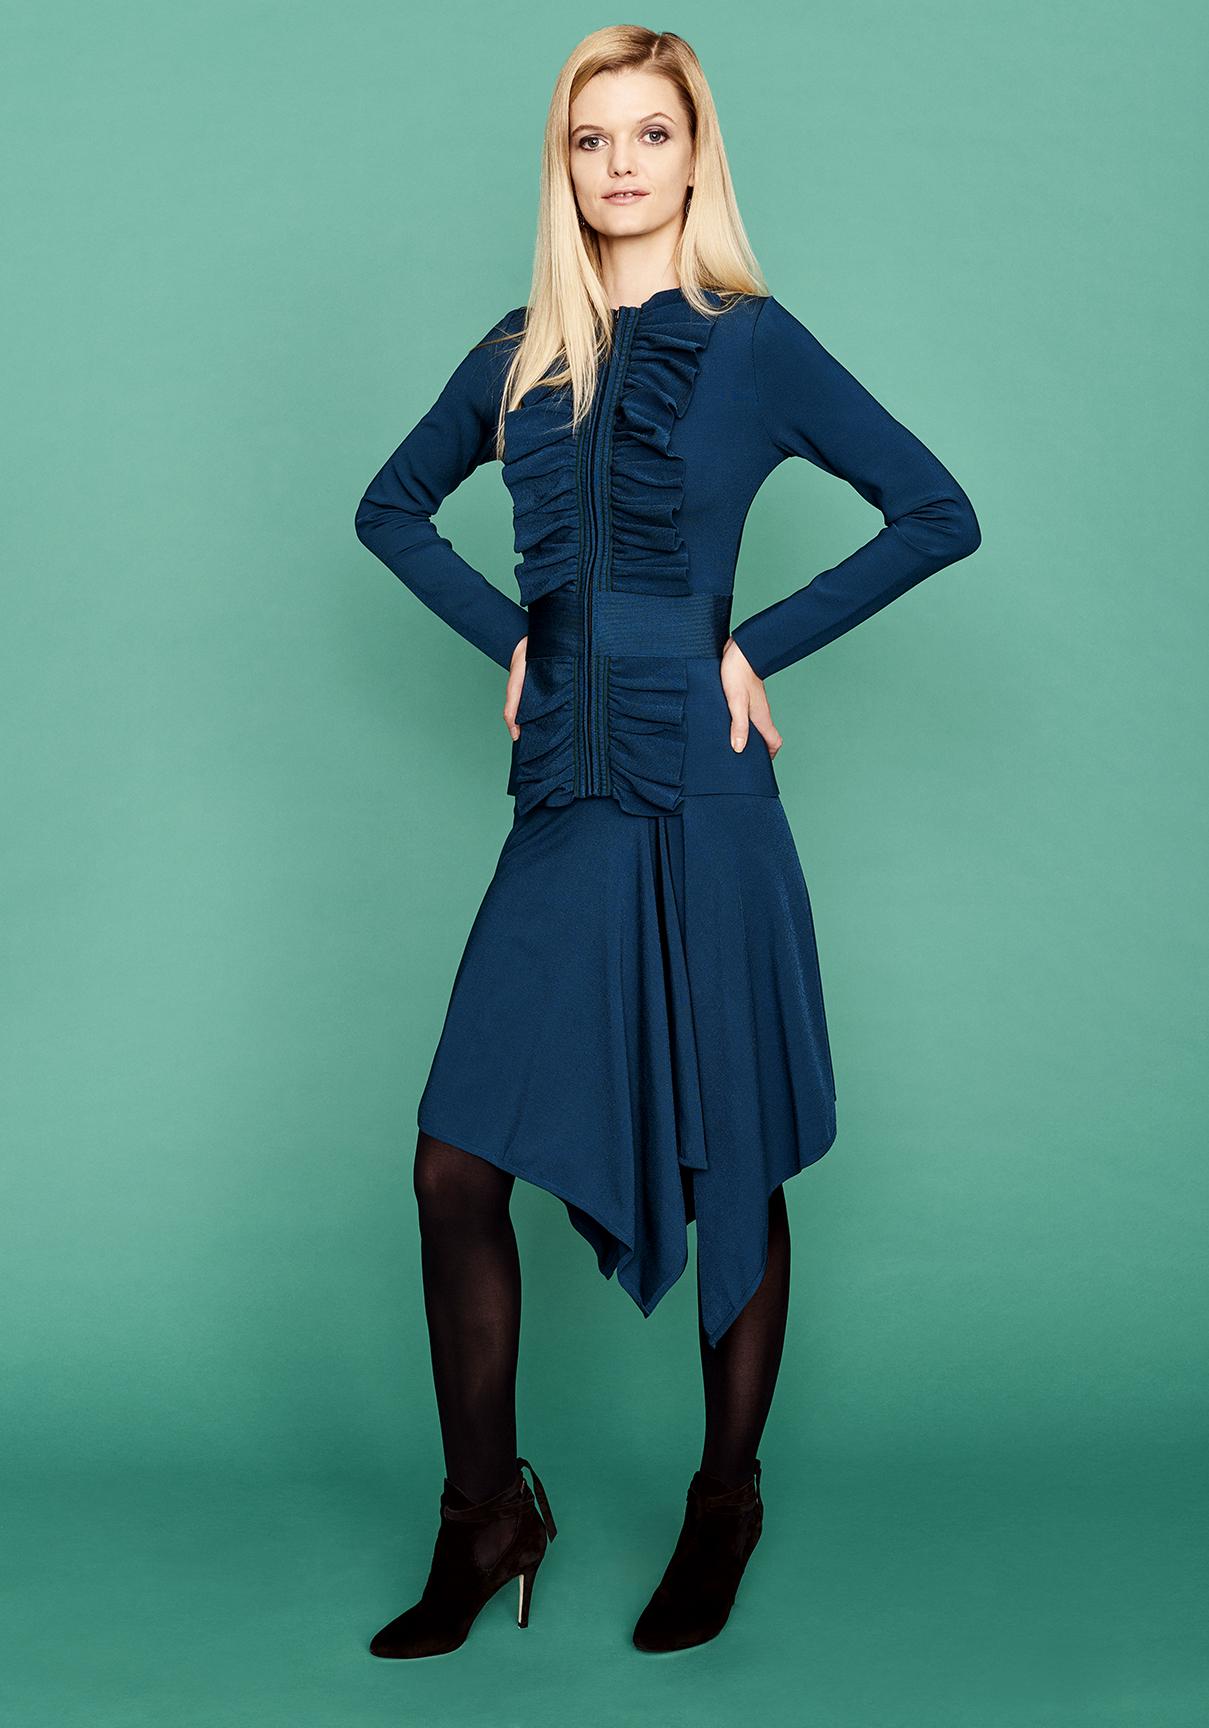 Official Blog of Fashion Designer Paula Hian